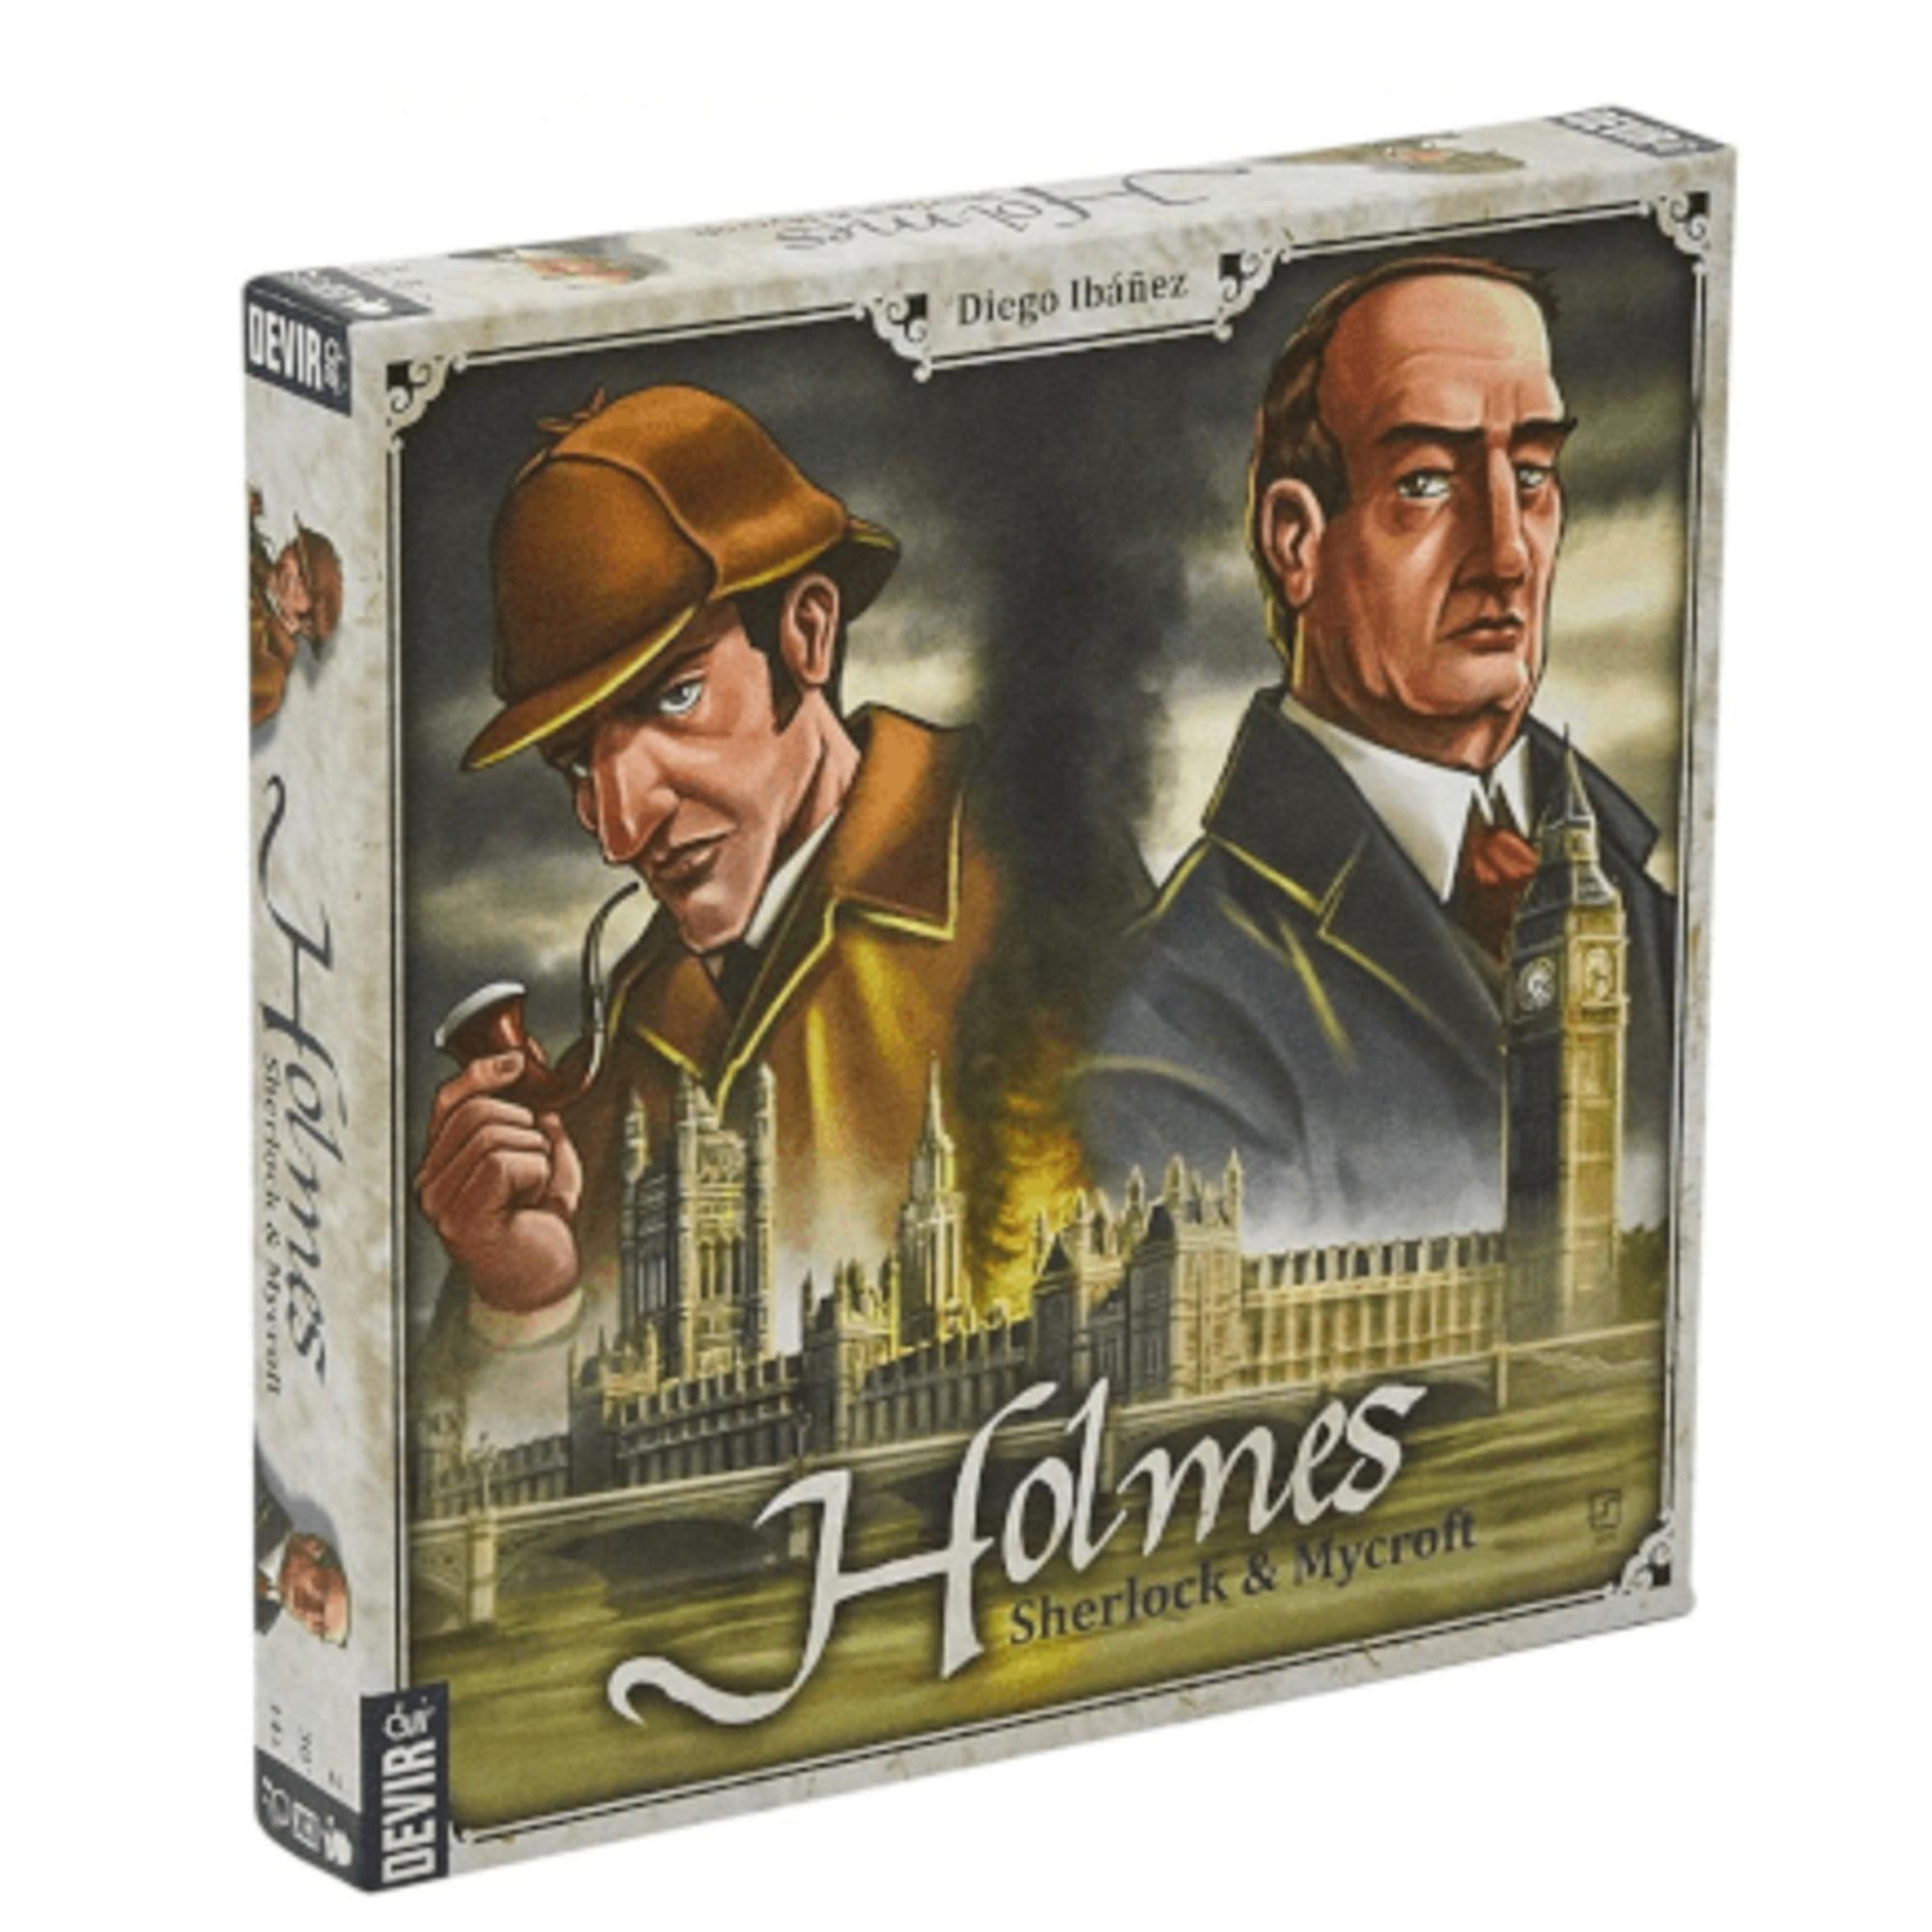 Holmes-Sherlock & Mycroft